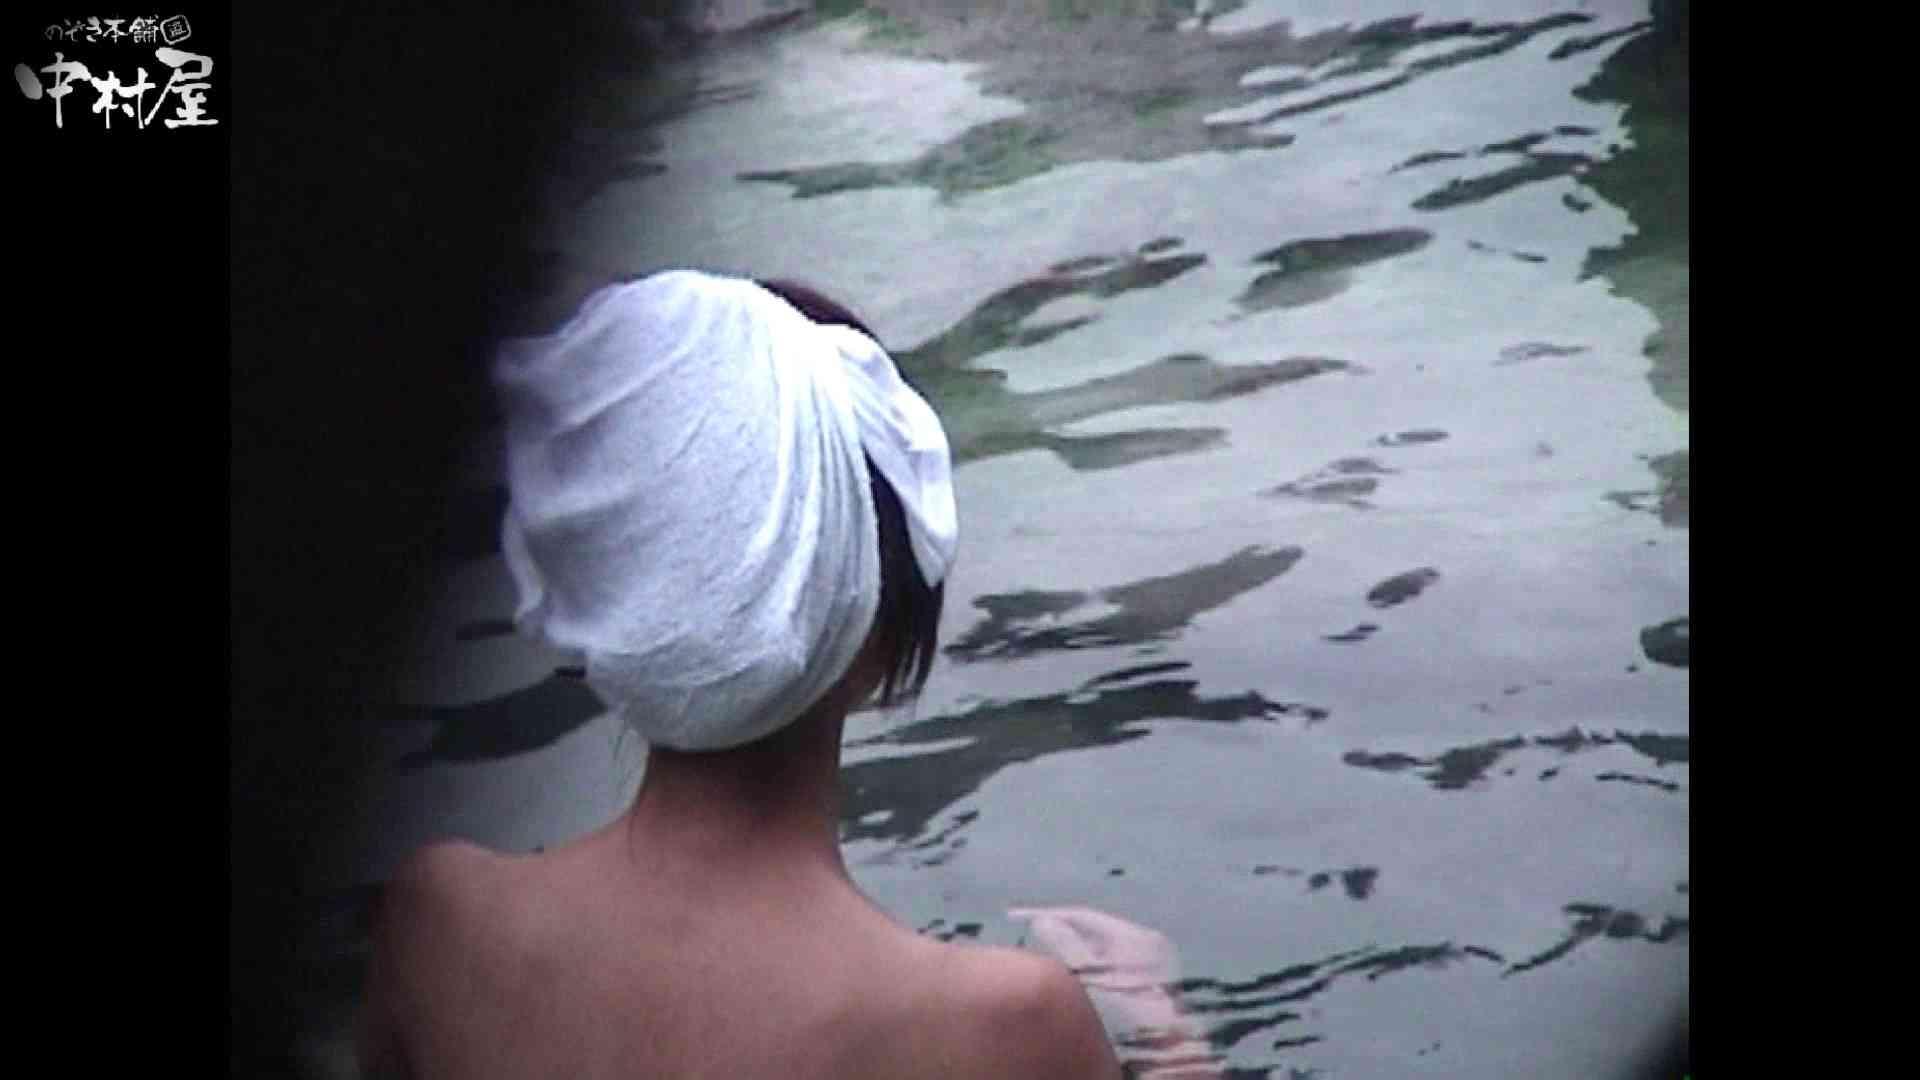 Aquaな露天風呂Vol.952 OLのエロ生活 おまんこ動画流出 106連発 65